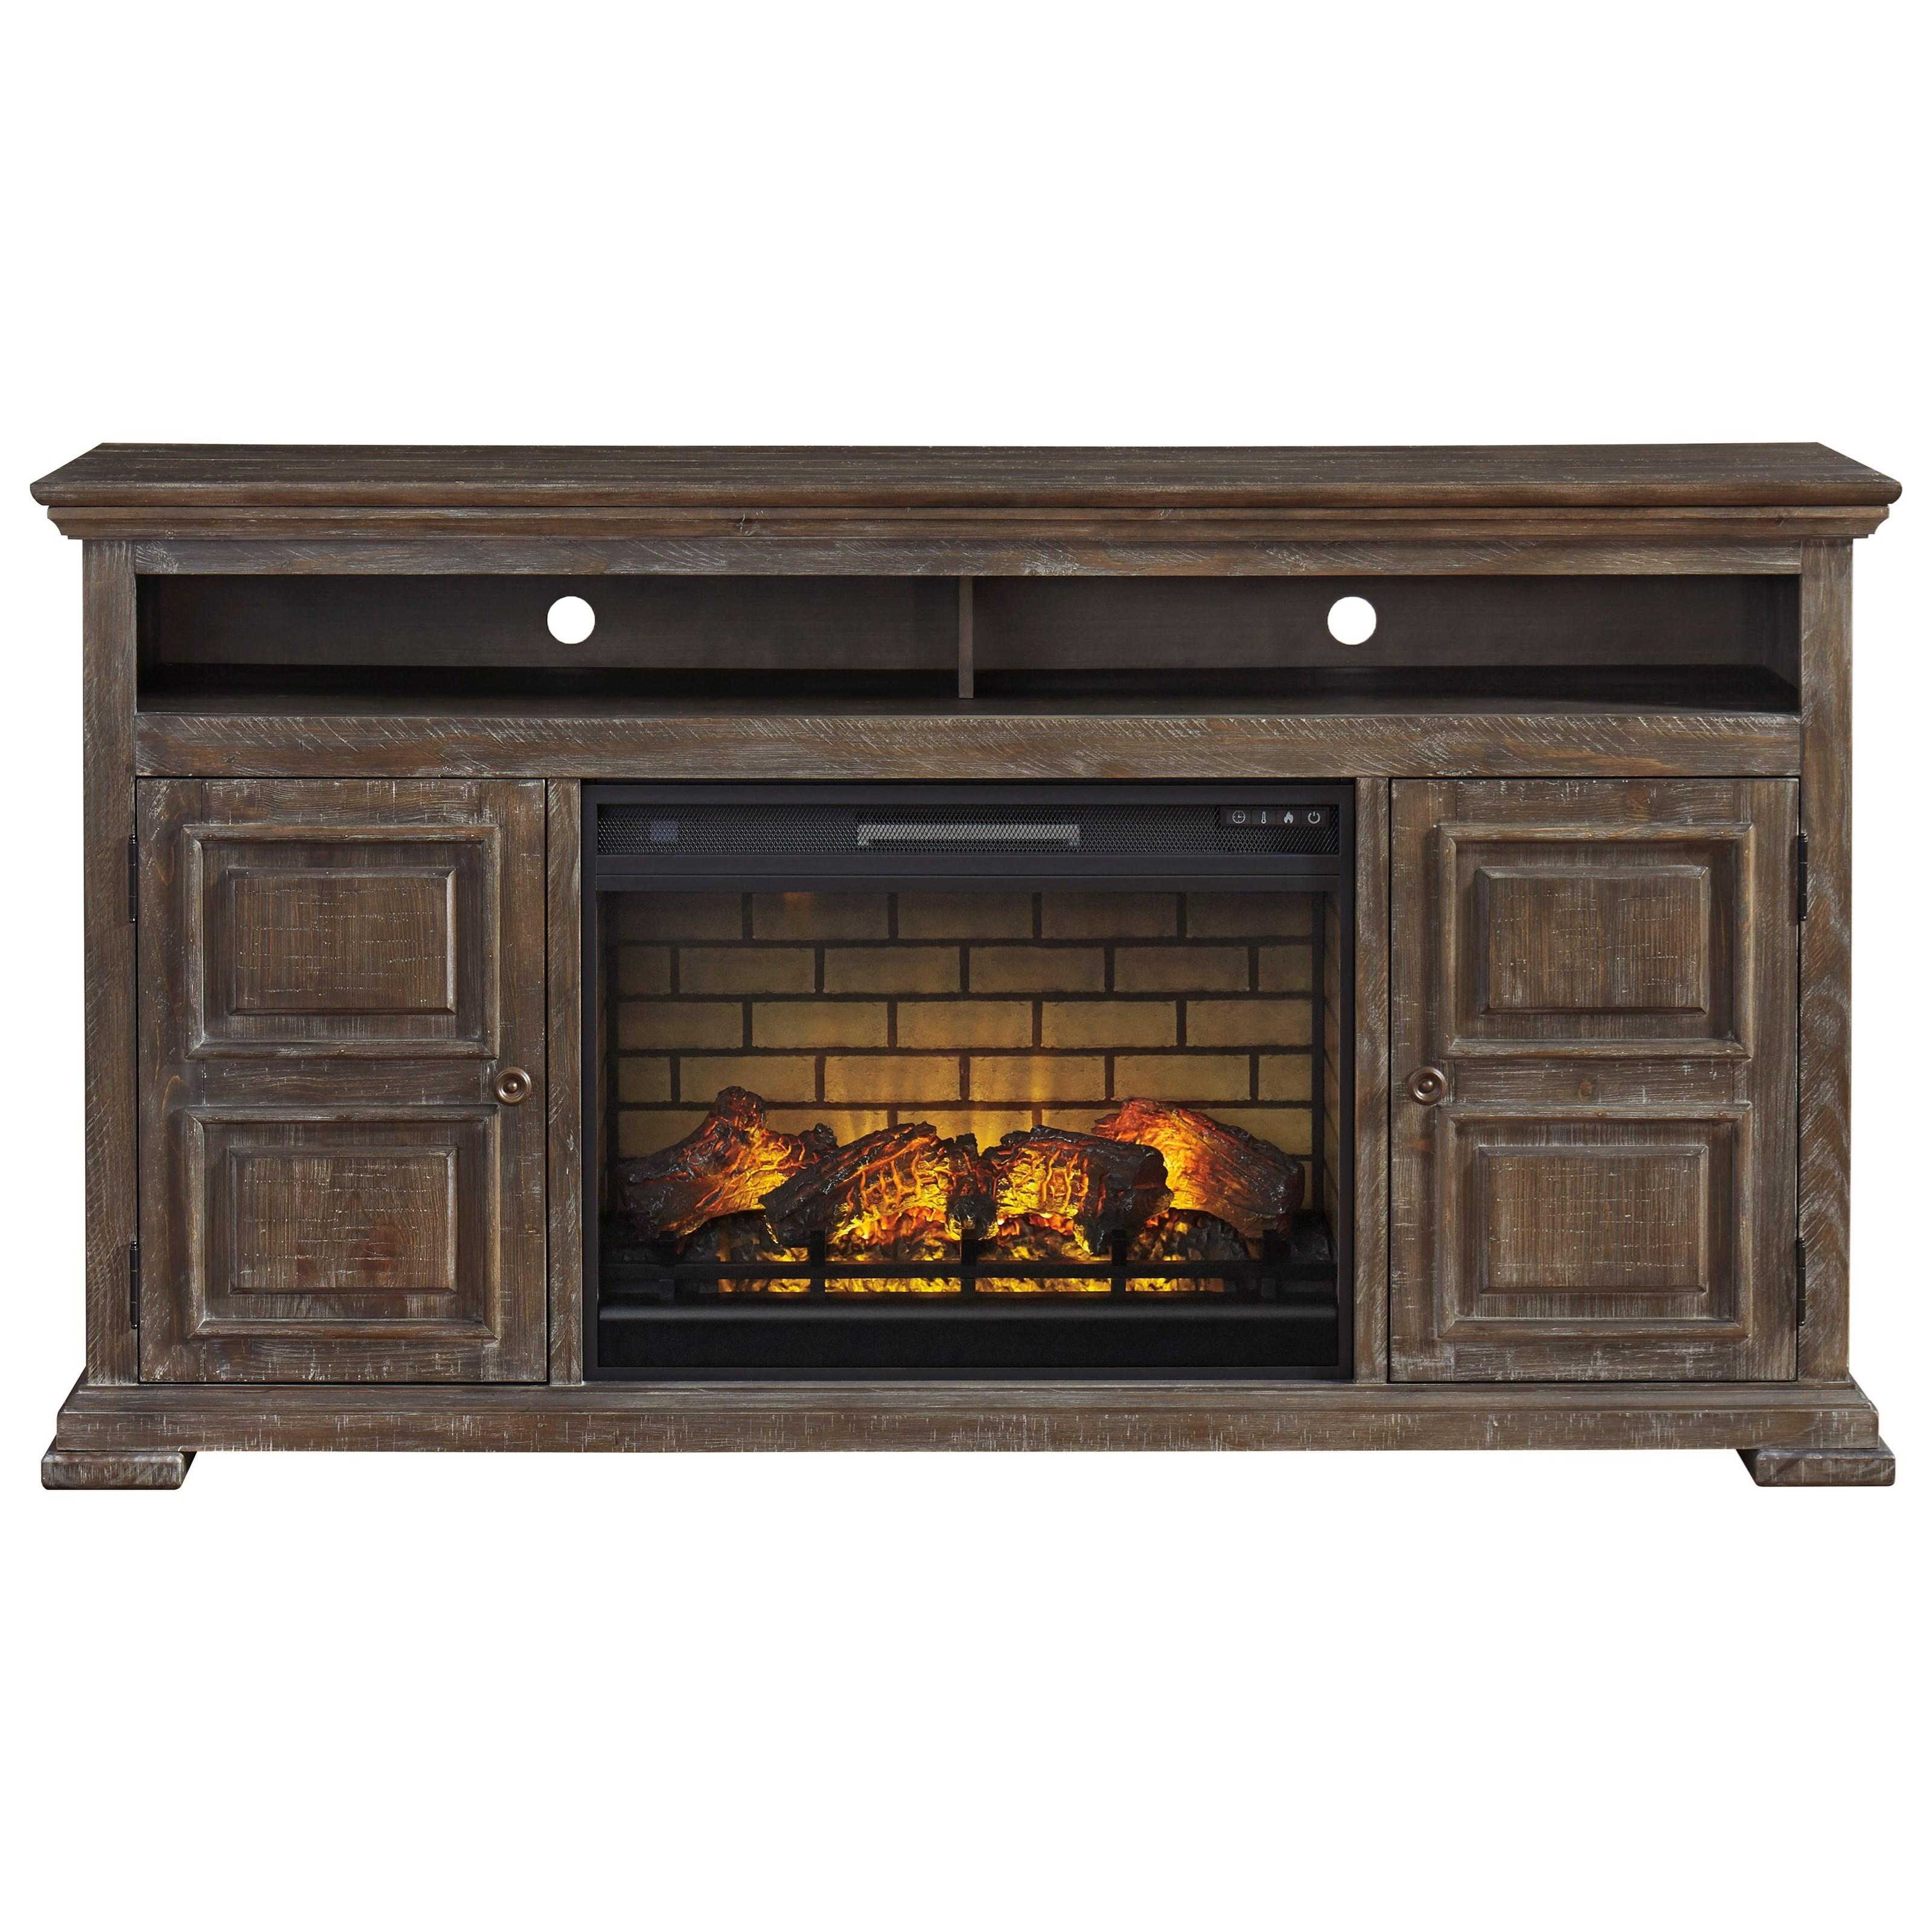 Wyndahl XL TV Stand w/ Fireplace by Ashley (Signature Design) at Johnny Janosik